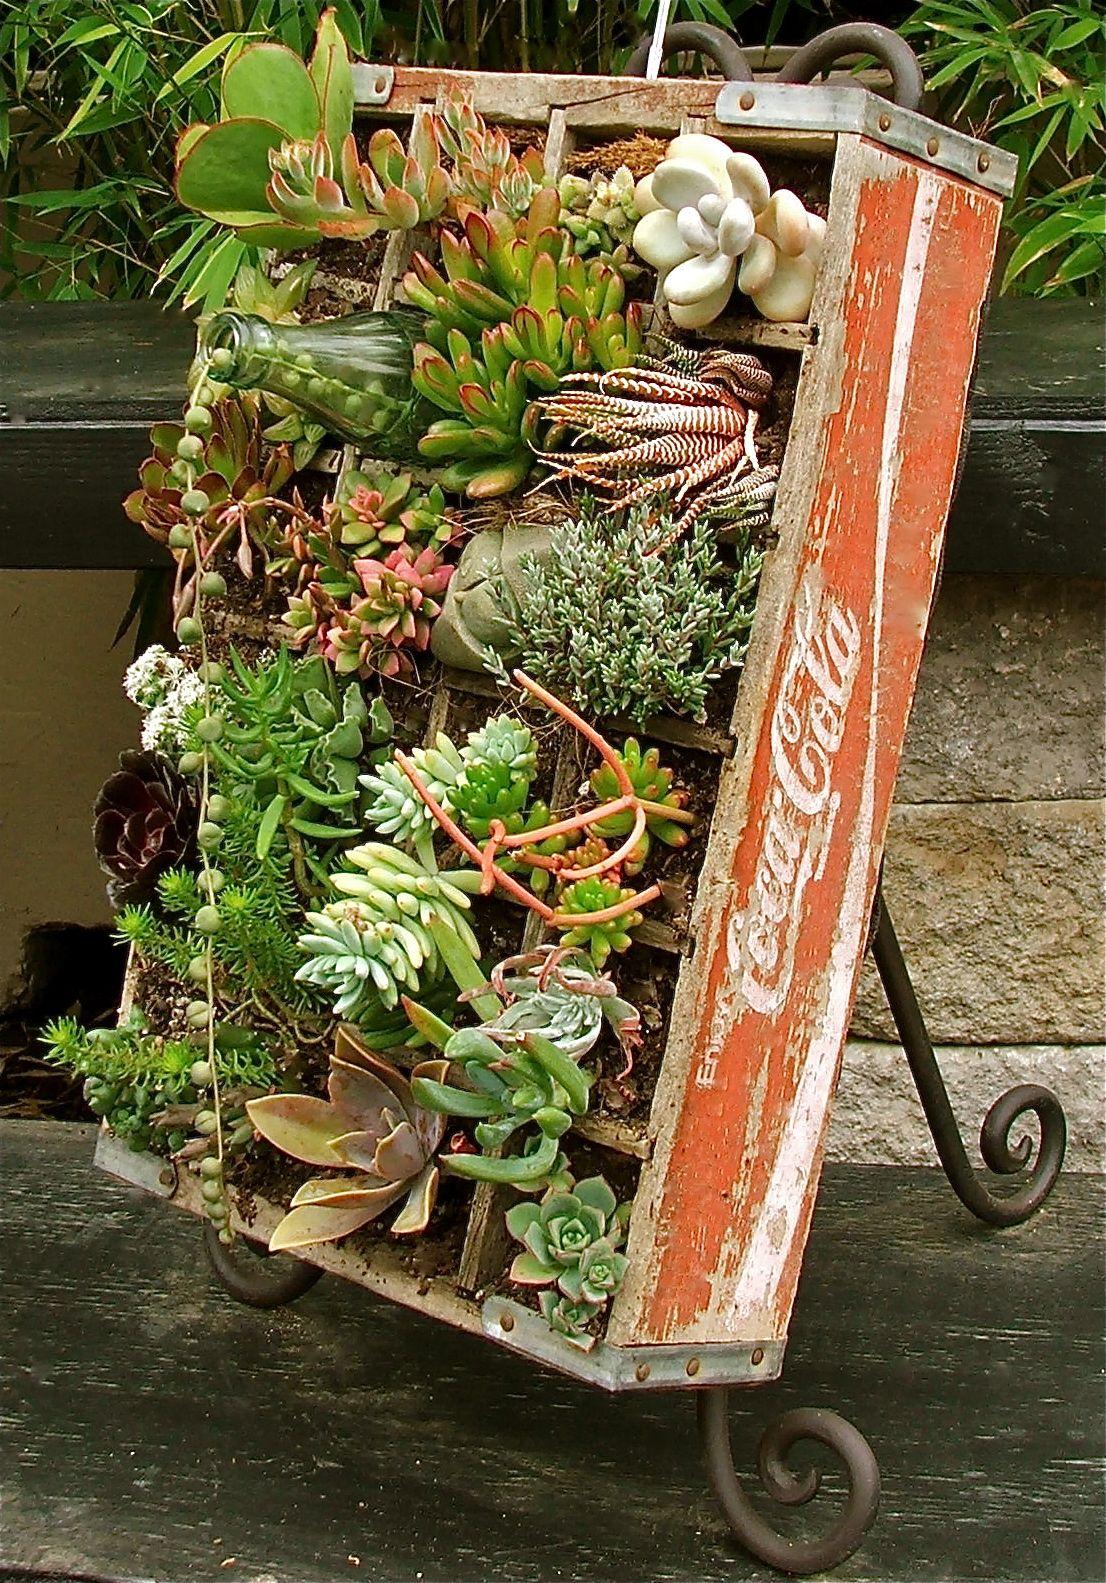 jardines-en-miniatura_pinbrowse